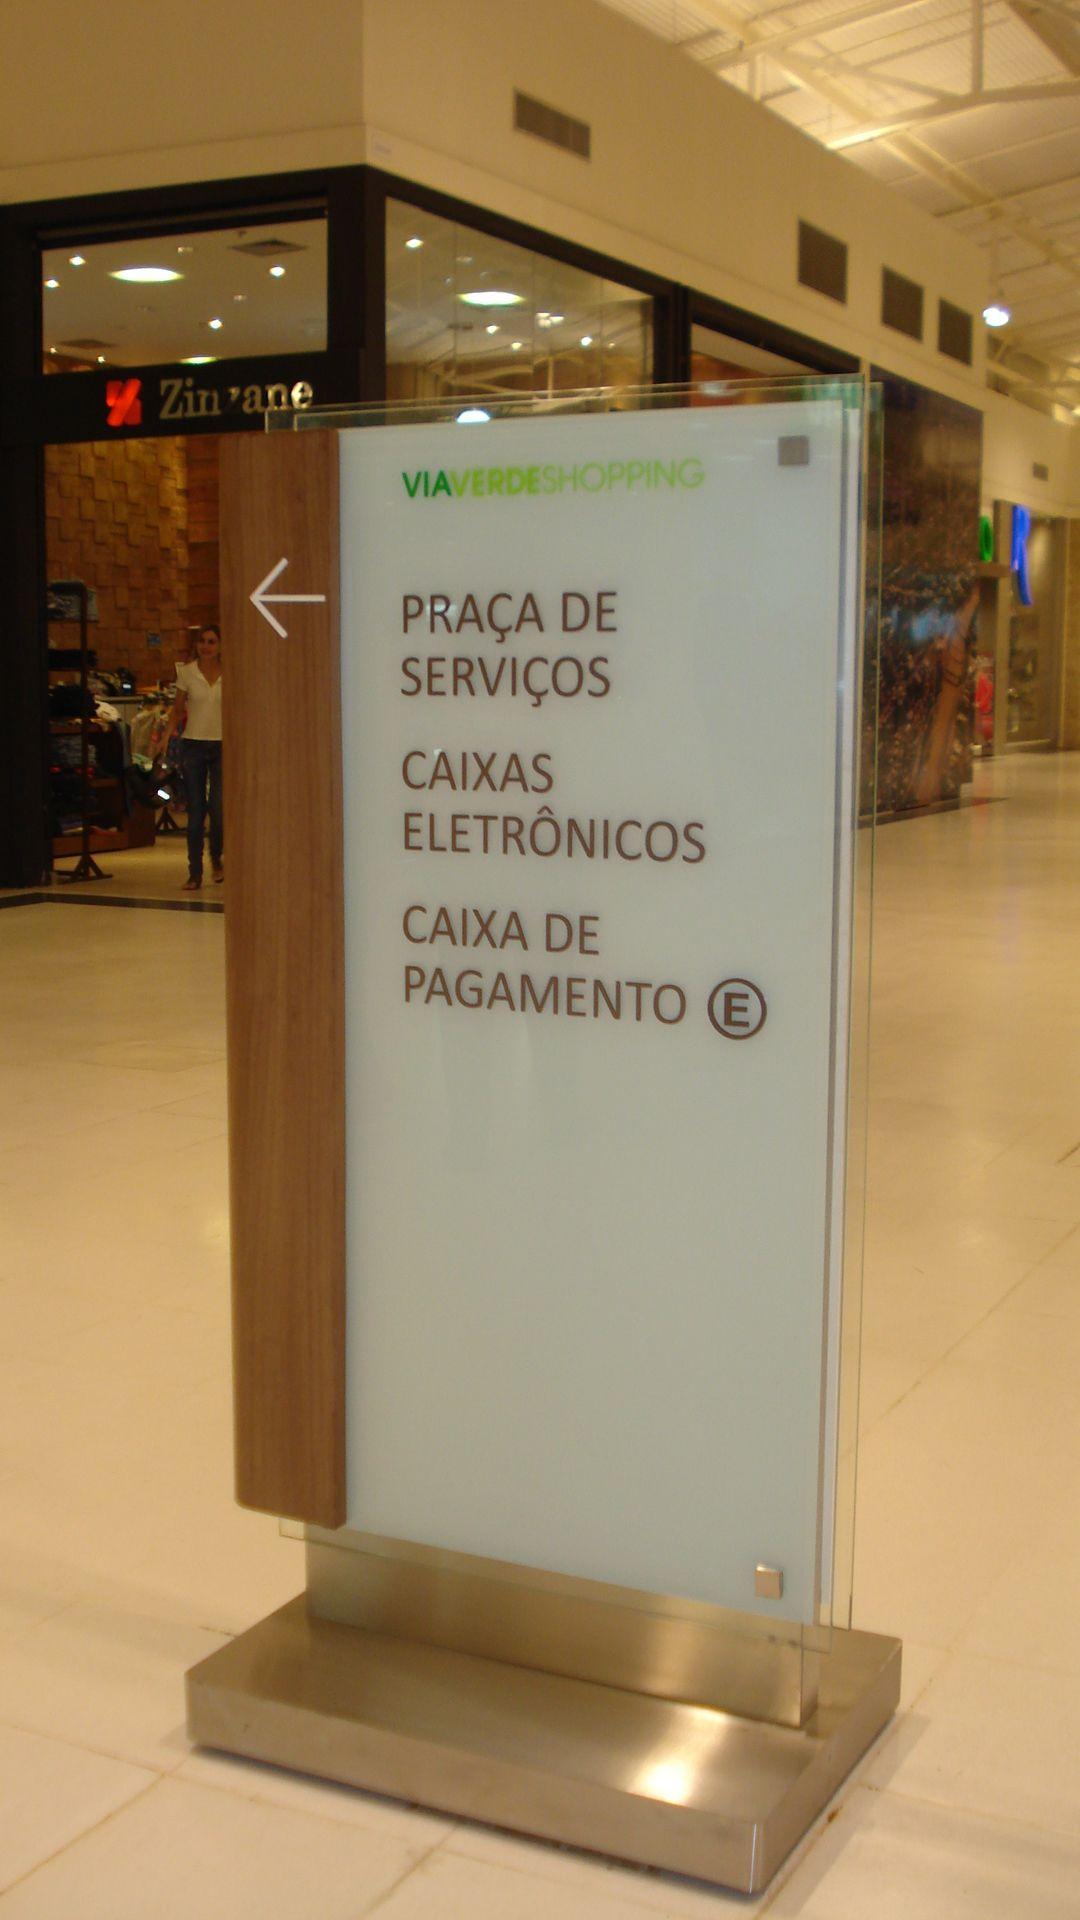 #Wayfinding #Directionalsign #ShoppingViaVerde - Rio Branco (AC) - Brazil #brazilian design #design #shopping #malls